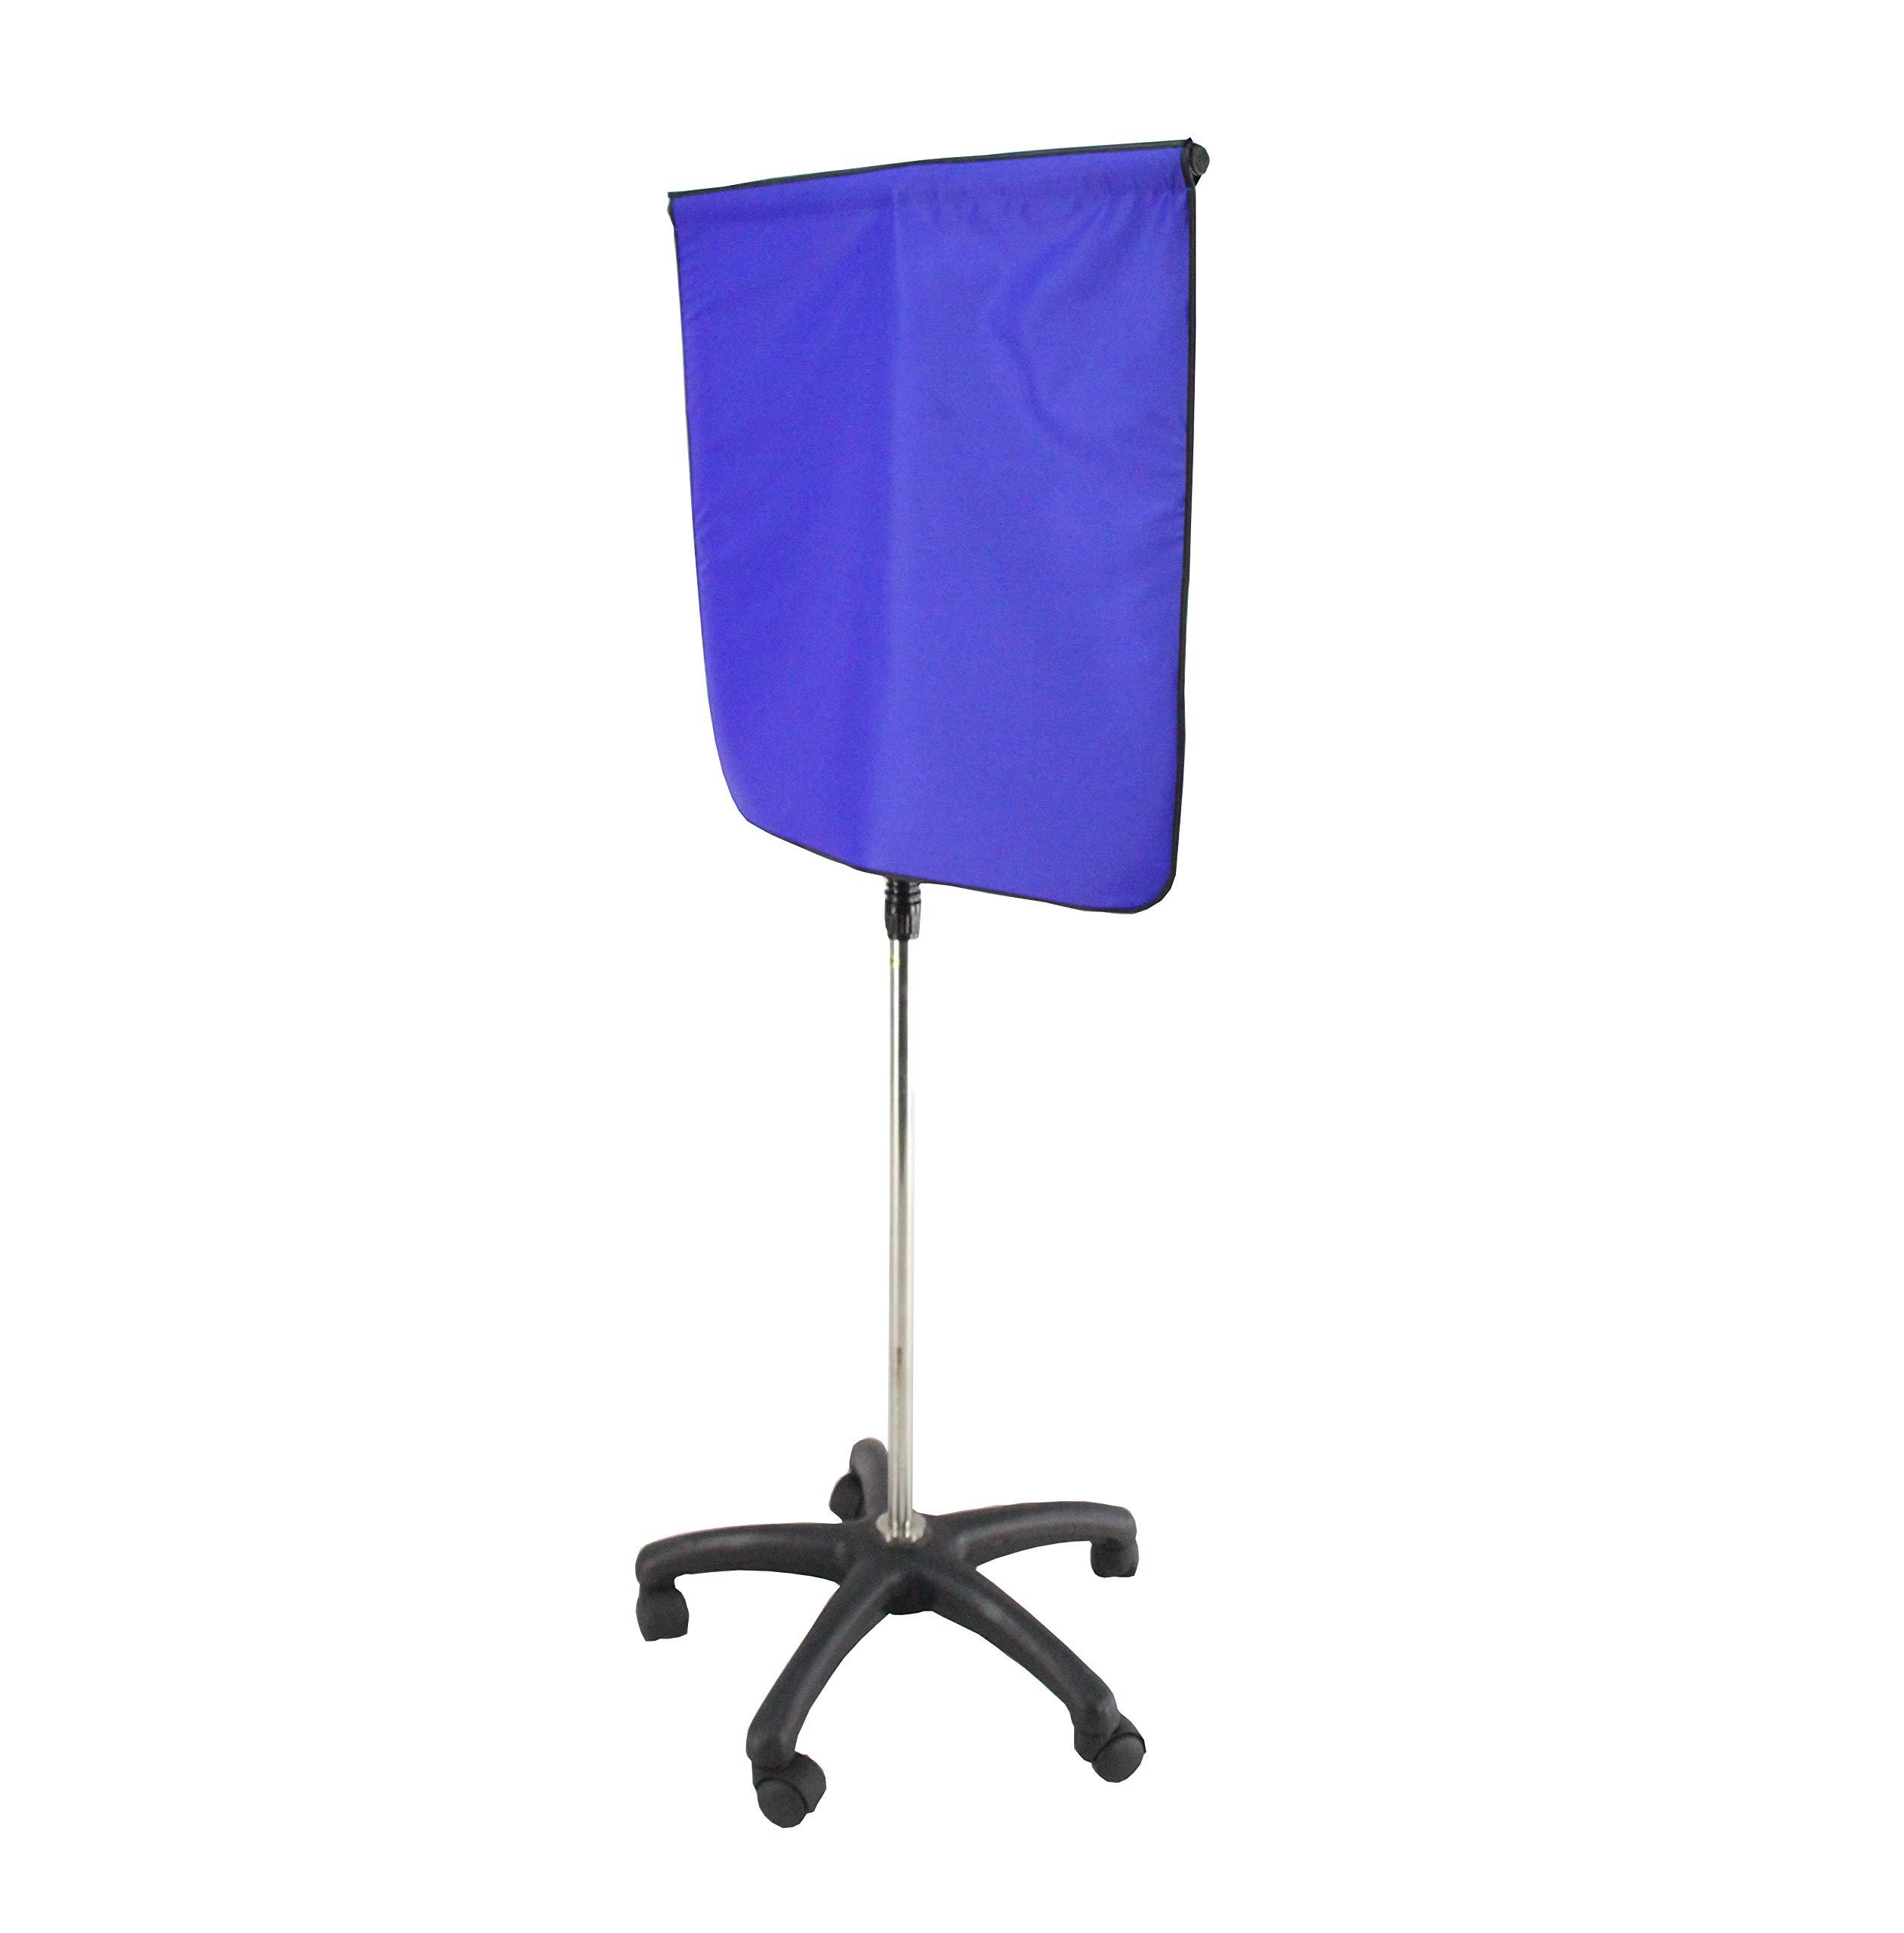 FixtureDisplays Porta-Shield Standard 28.5''-54.5''H for X-Ray MRI CT Radiation Protection 15676